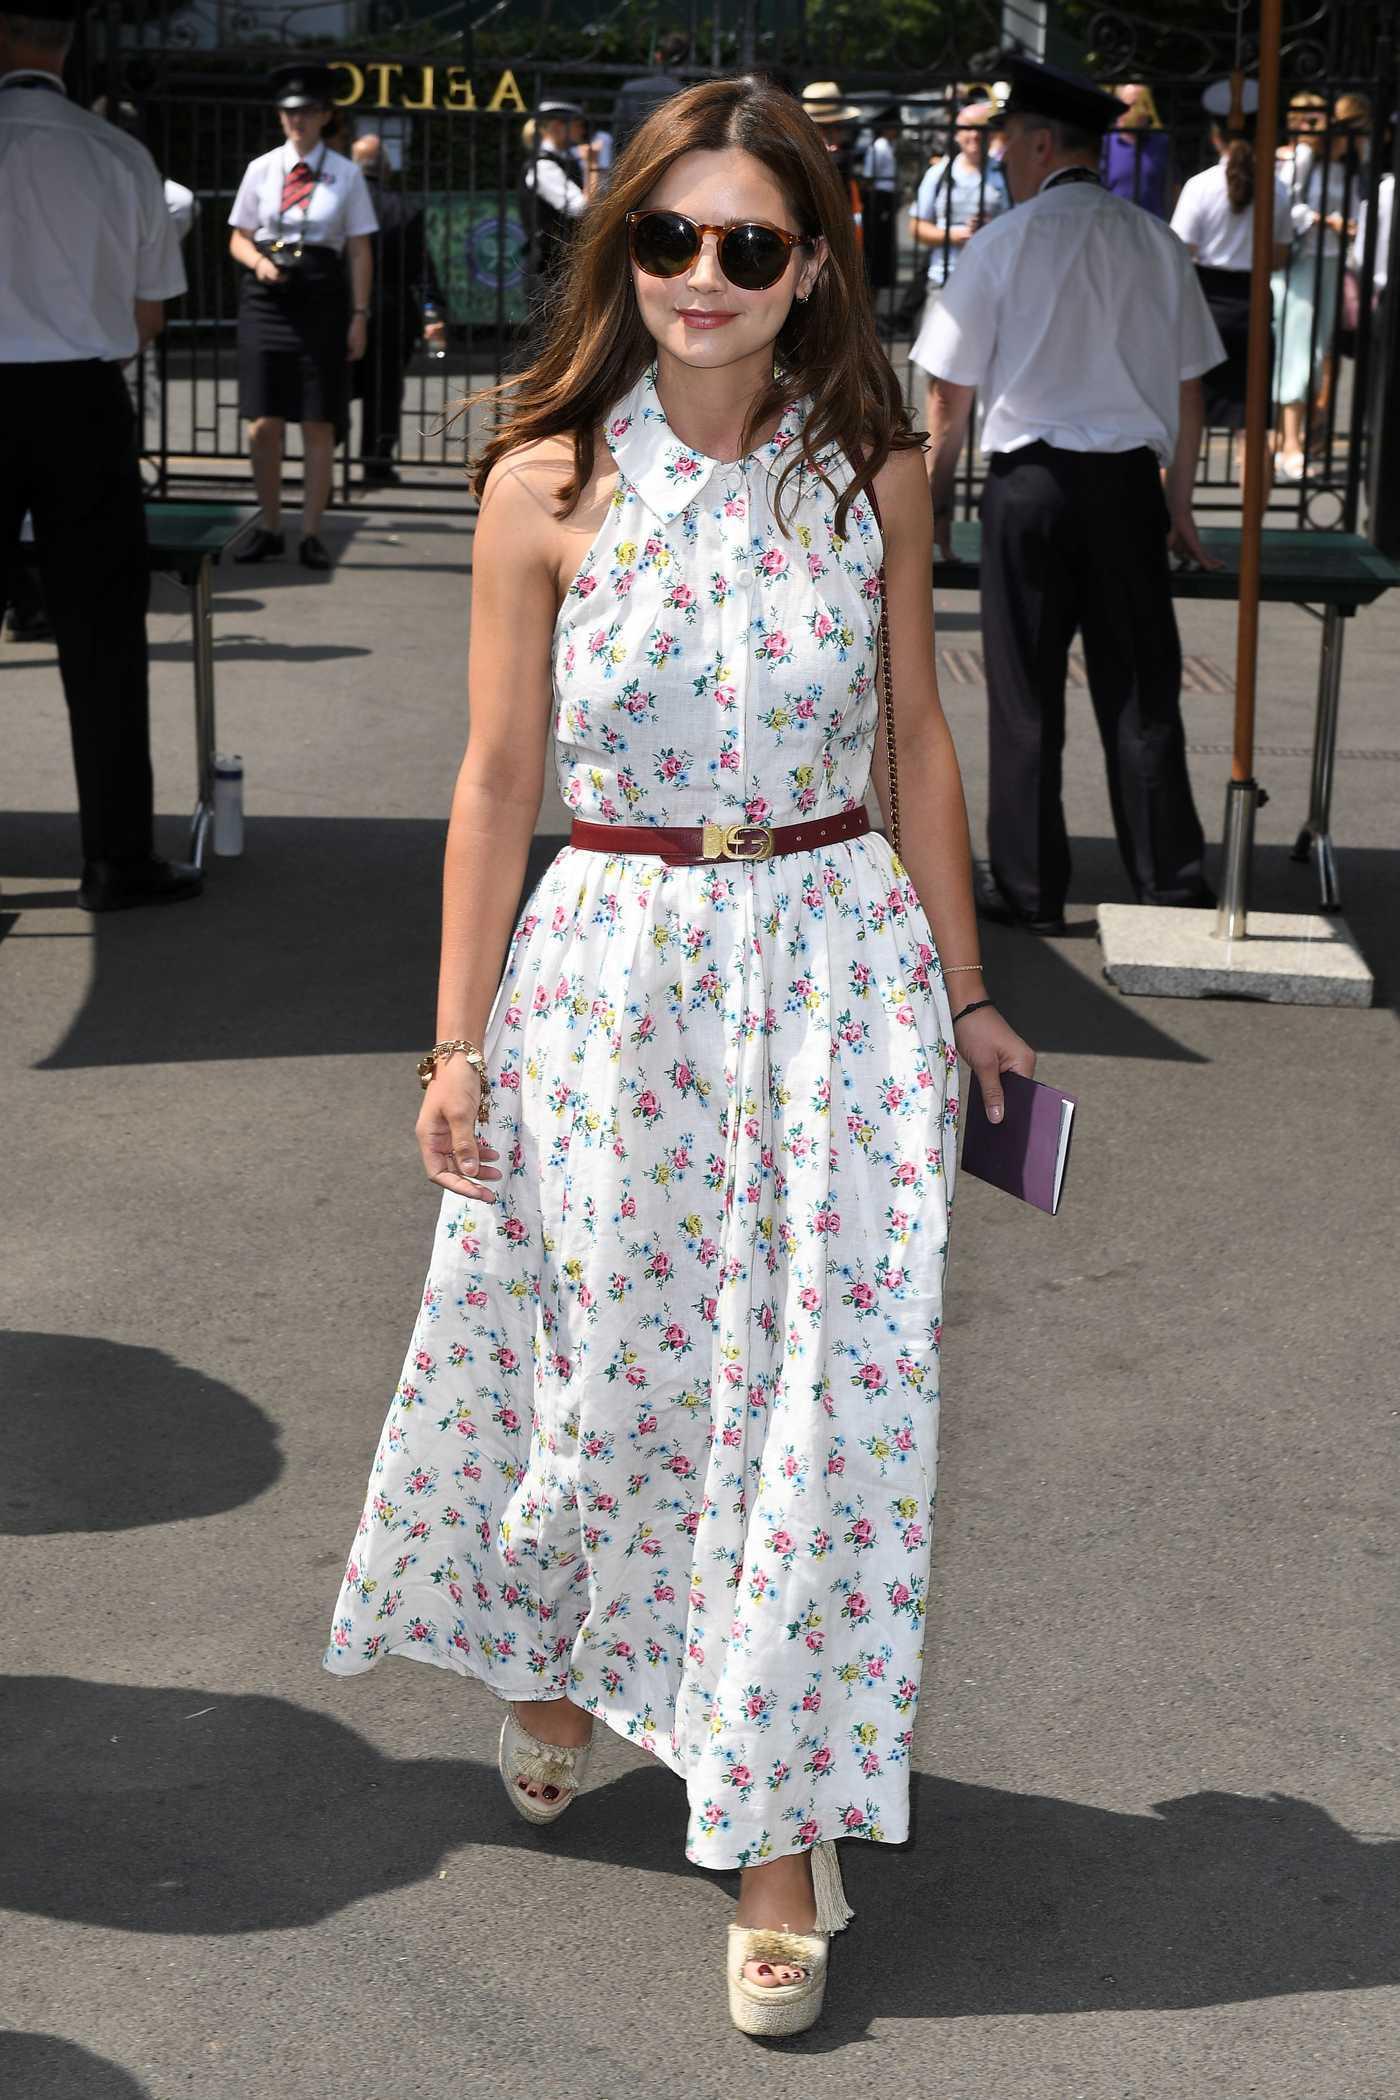 Jenna-Louise Coleman Arrives at Wimbledon Tennis Tournament in London 07/13/2018